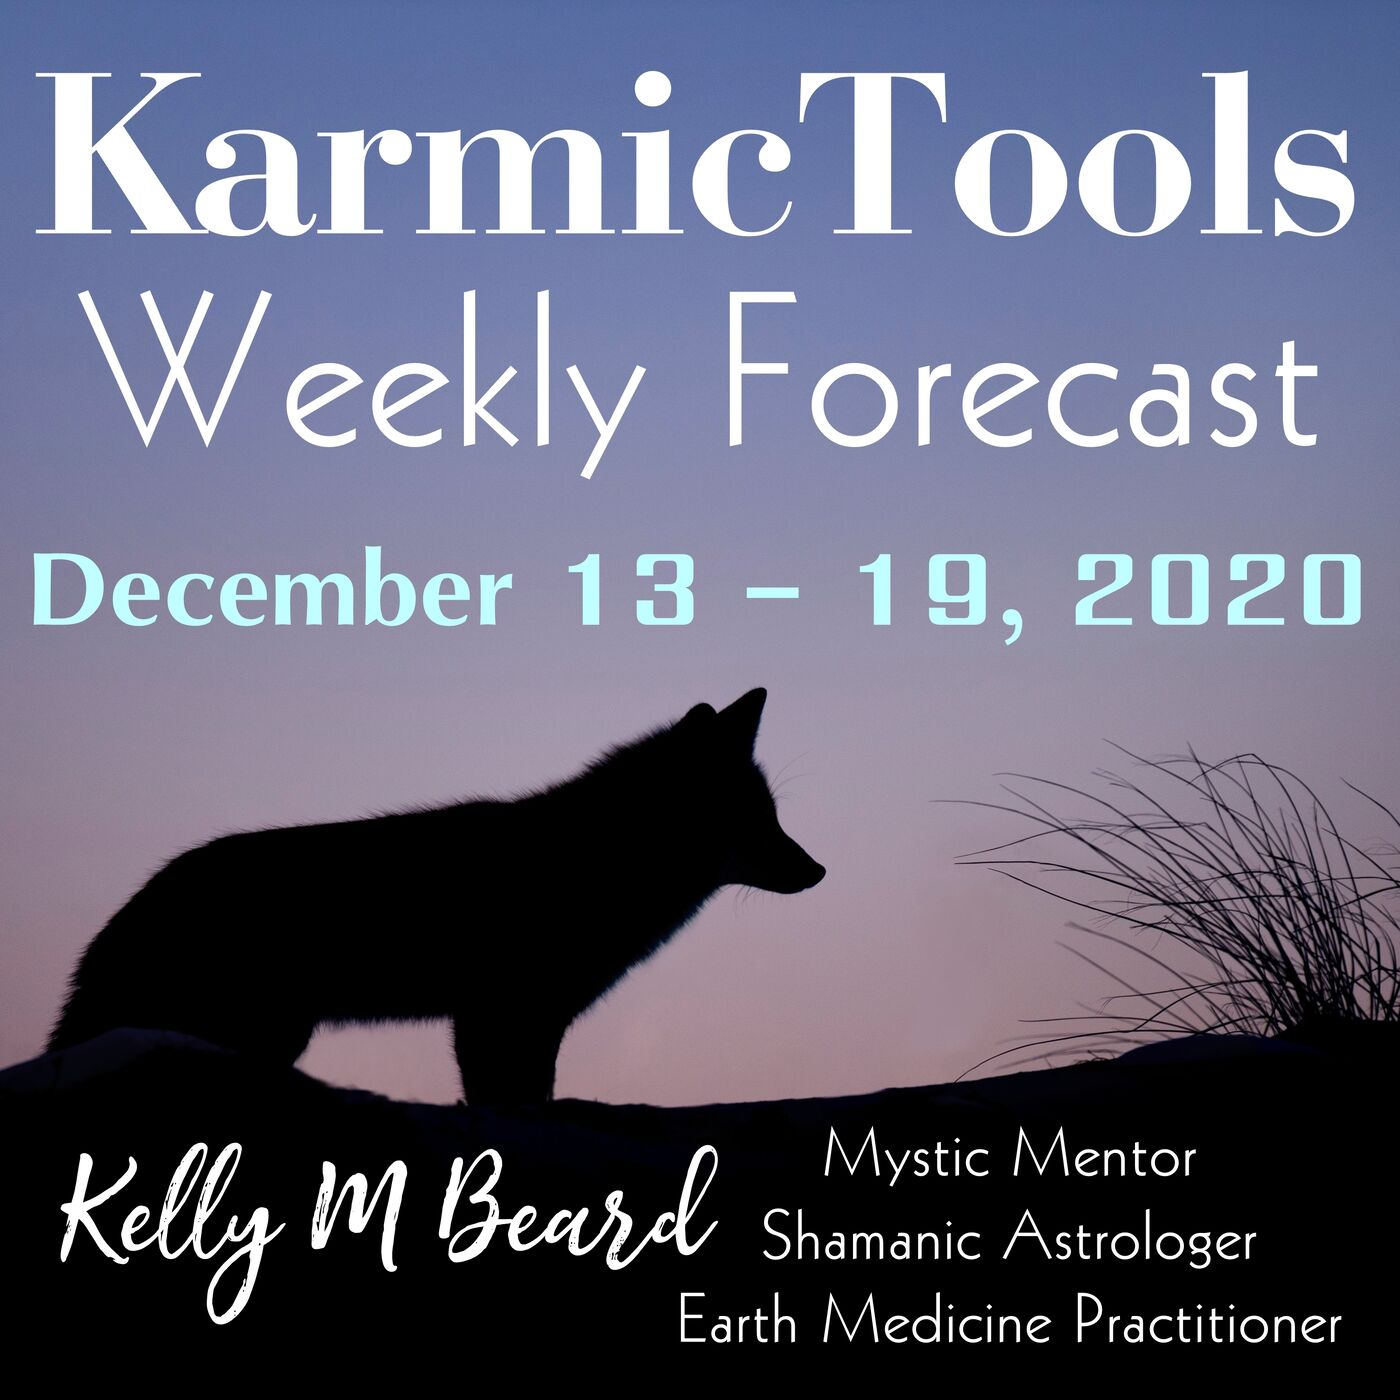 Dec 13 - 19, 2020 KarmicTools Weekly Forecast